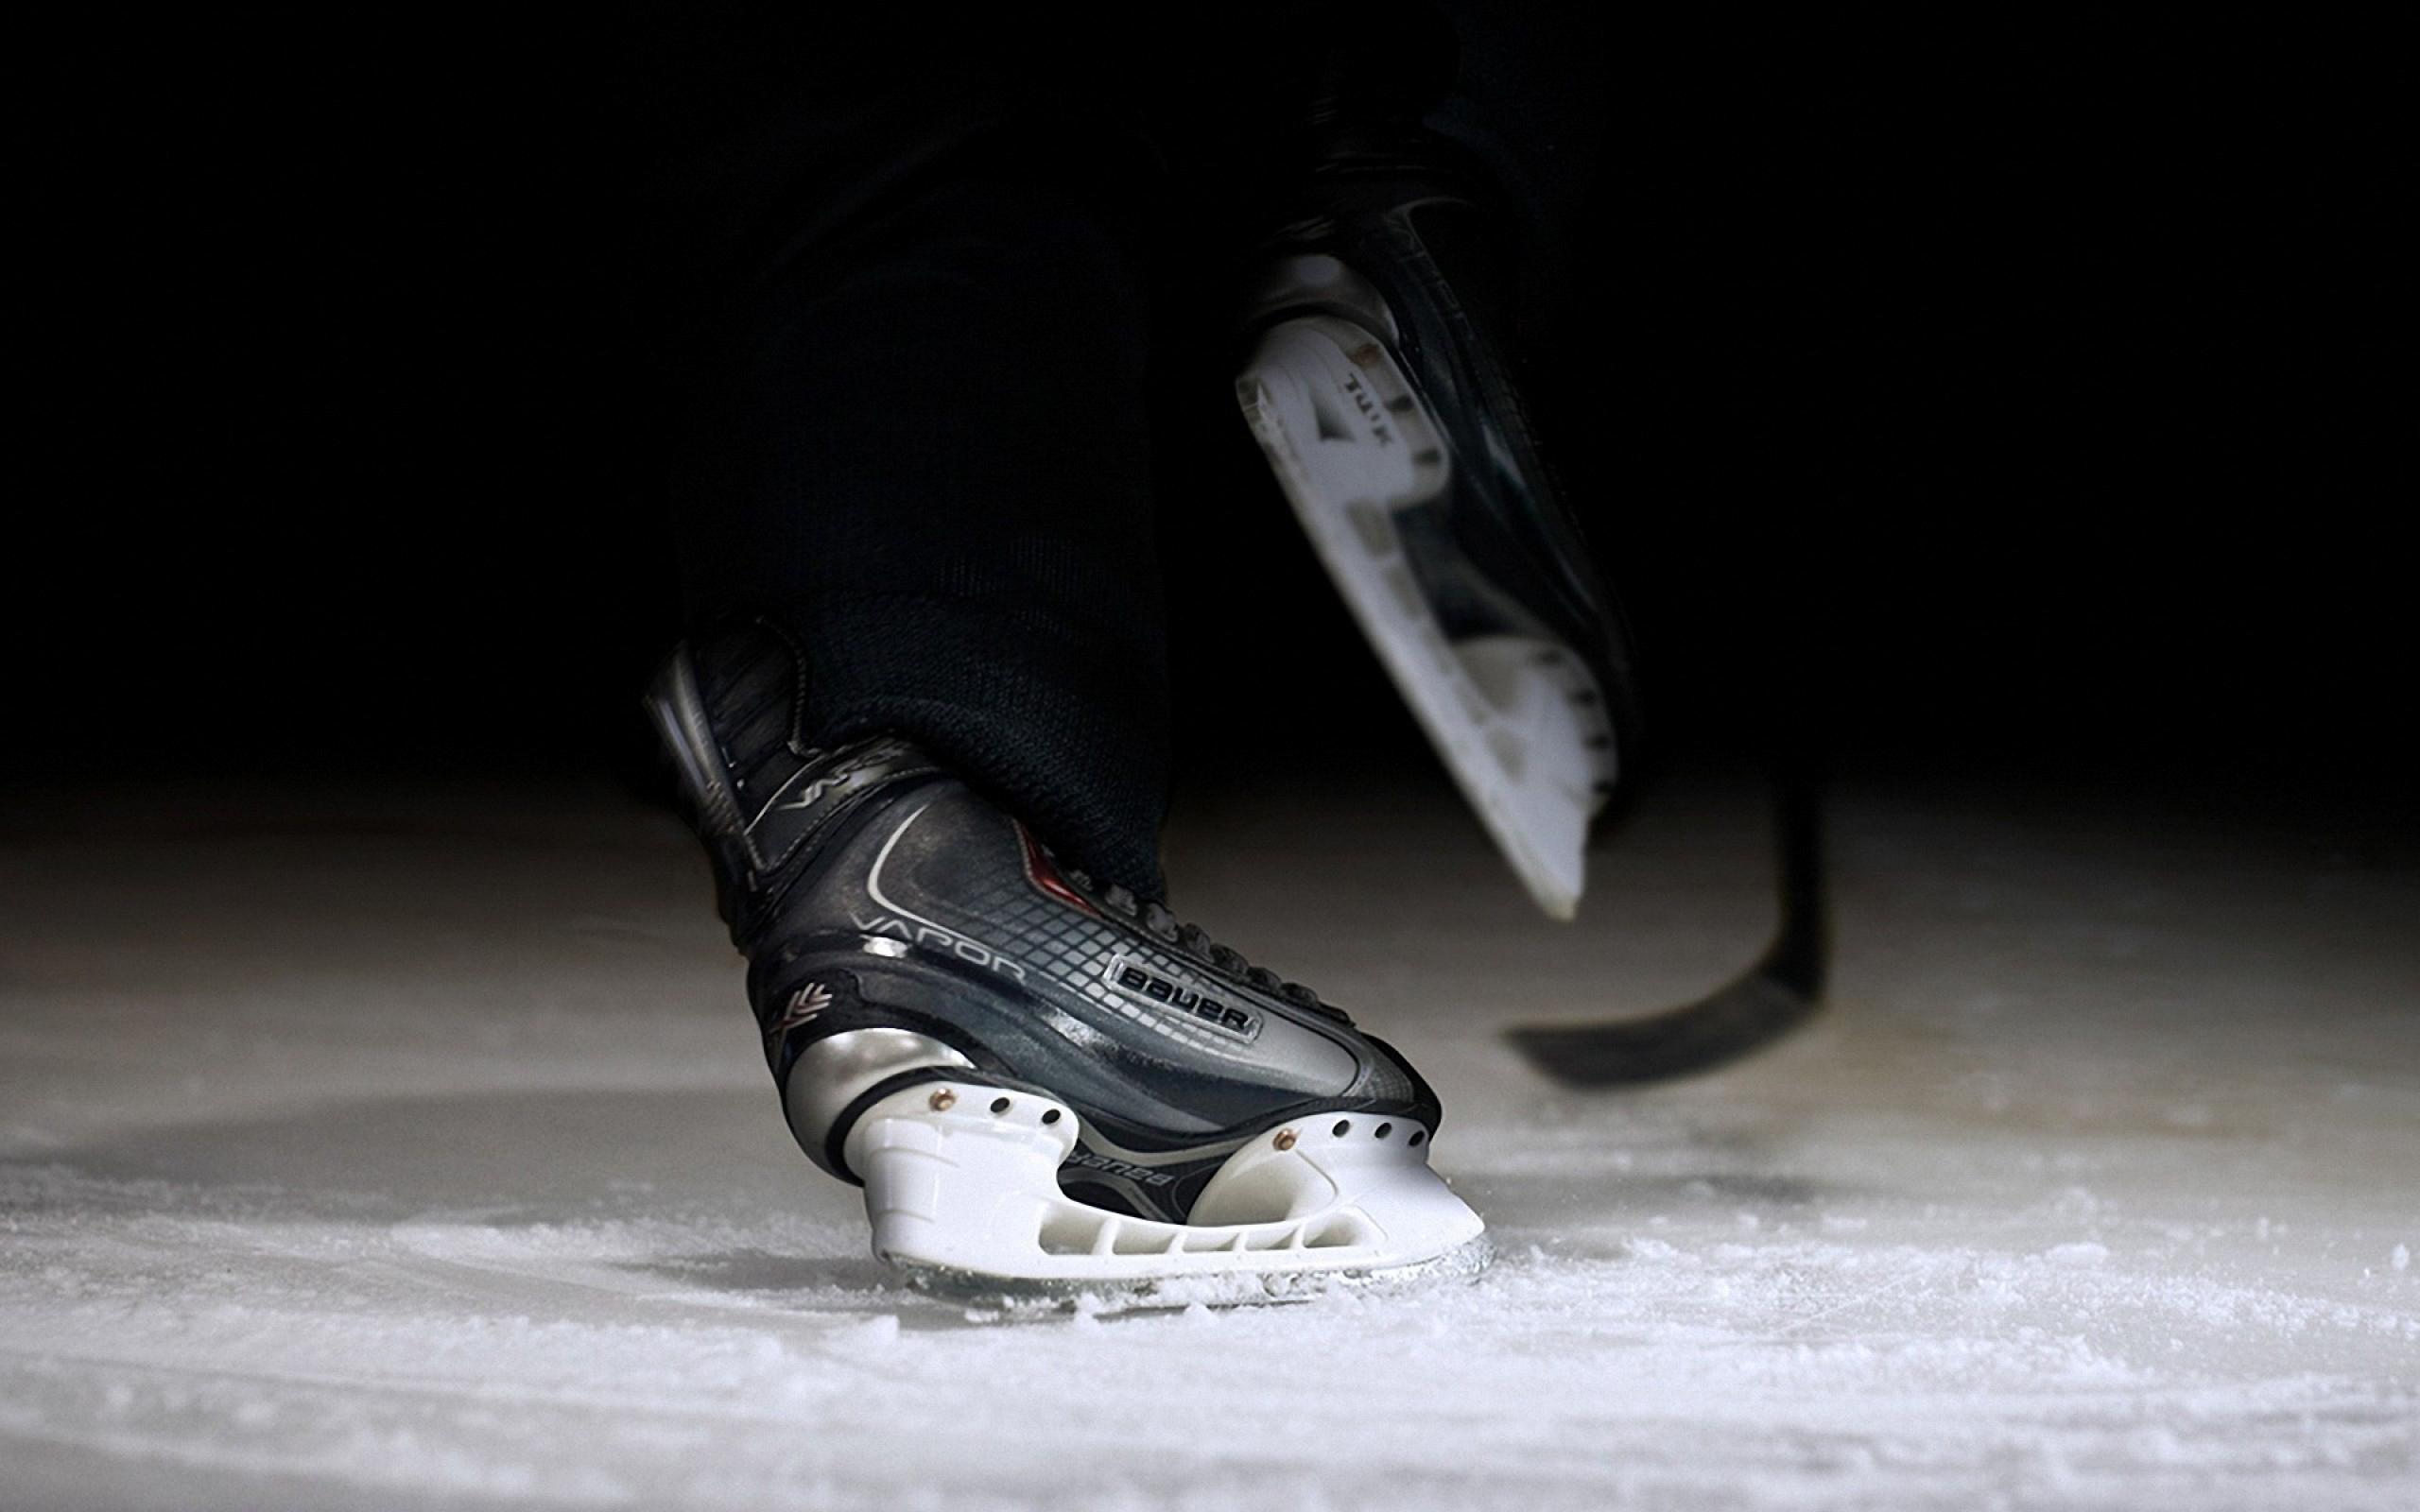 Bauer Hockey Skates On Ice Desktop Wallpapers 1920x1080